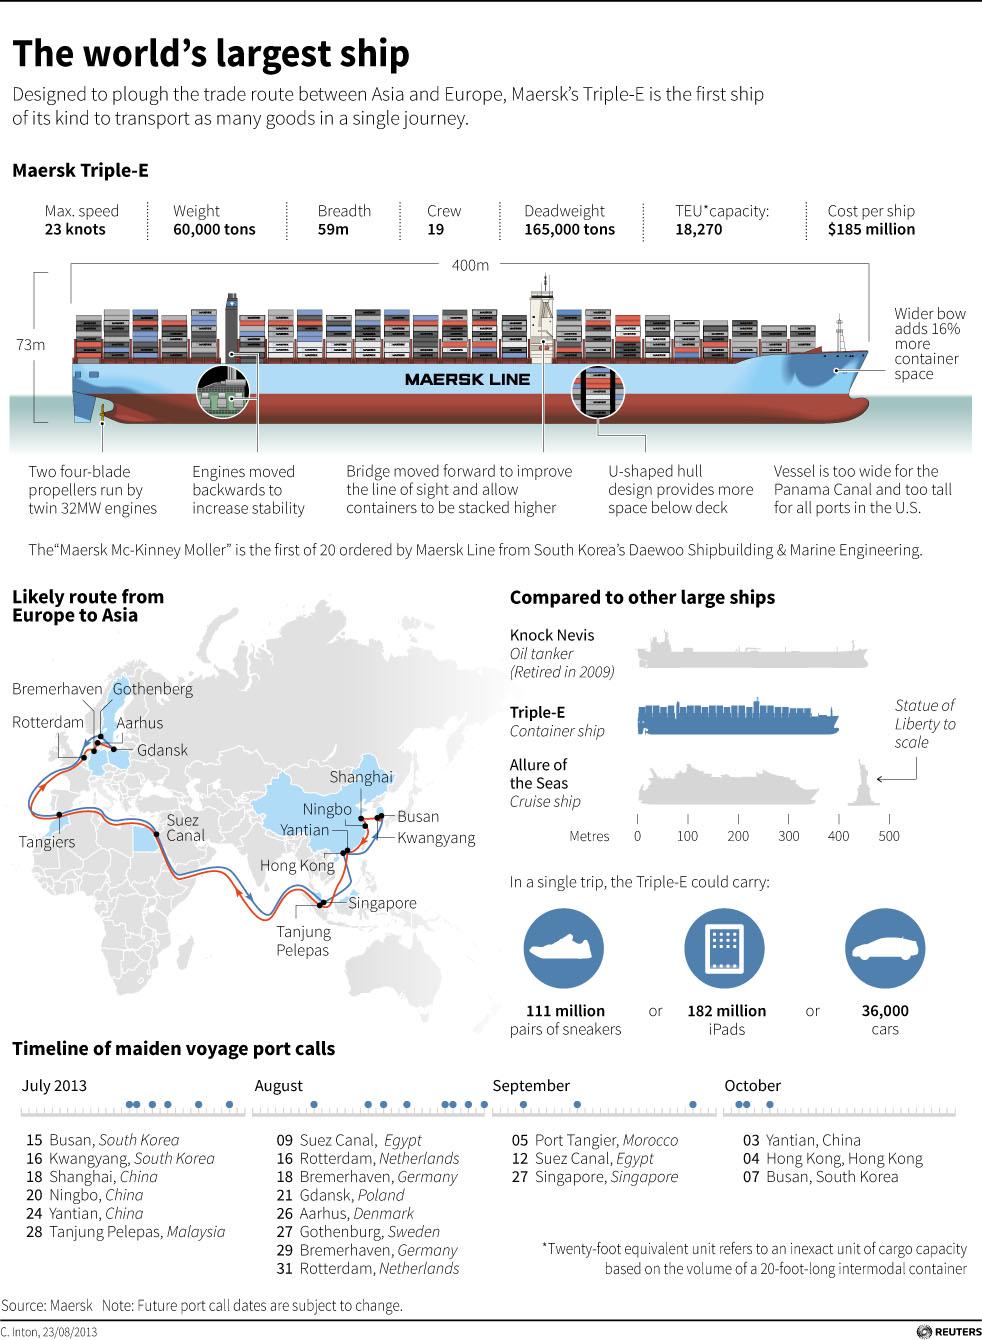 Maersk's Tripe-E ship